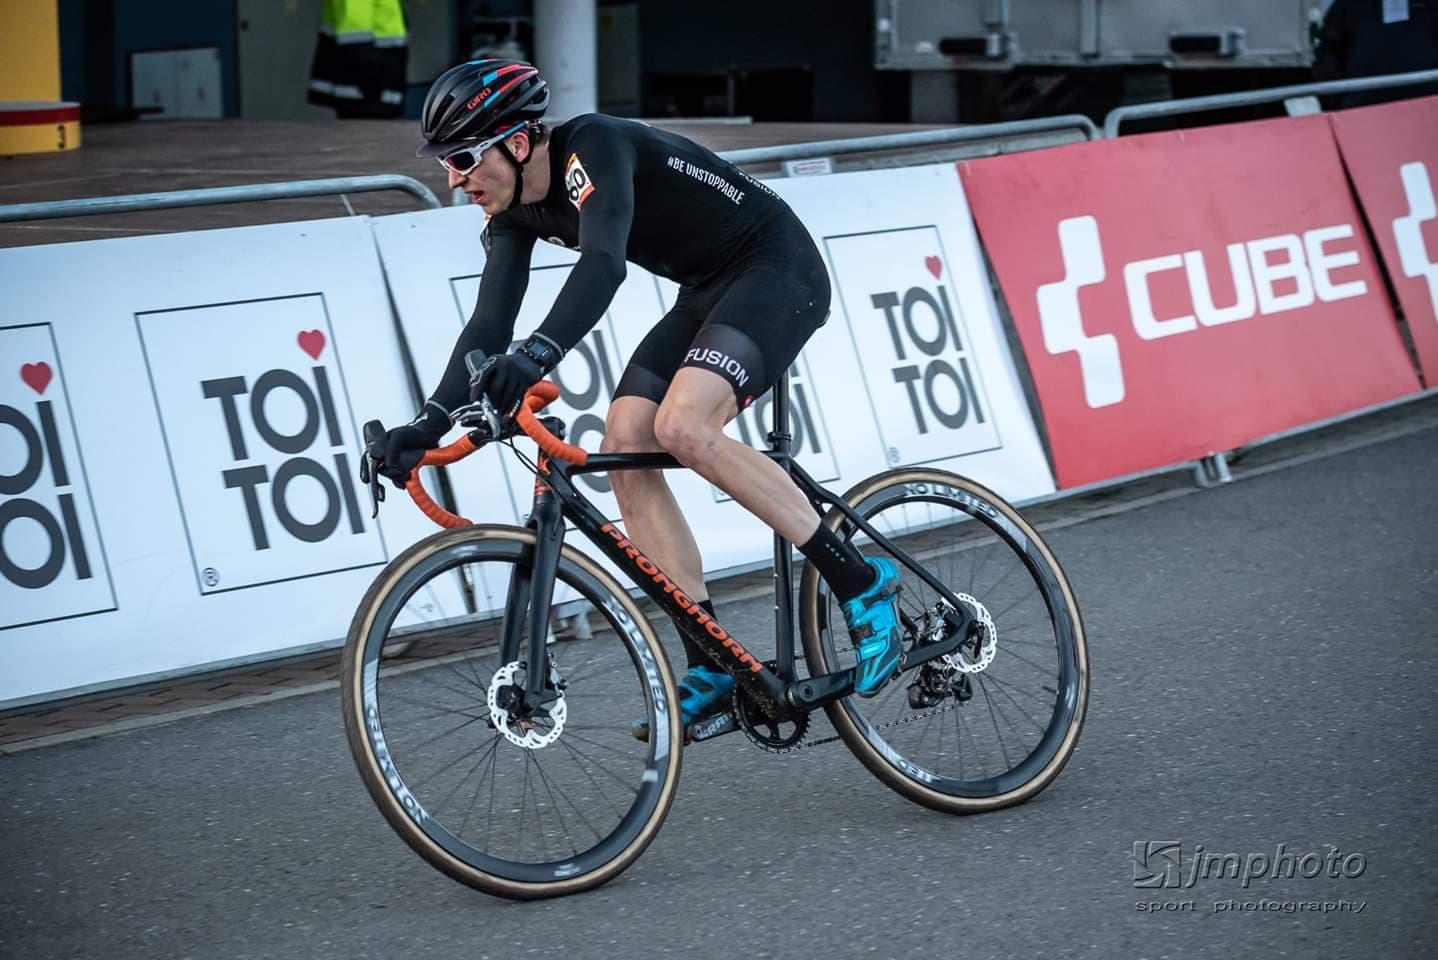 karol michalski pronghorn racing puchar świata cx tabor 2018 fot jmphoto 2